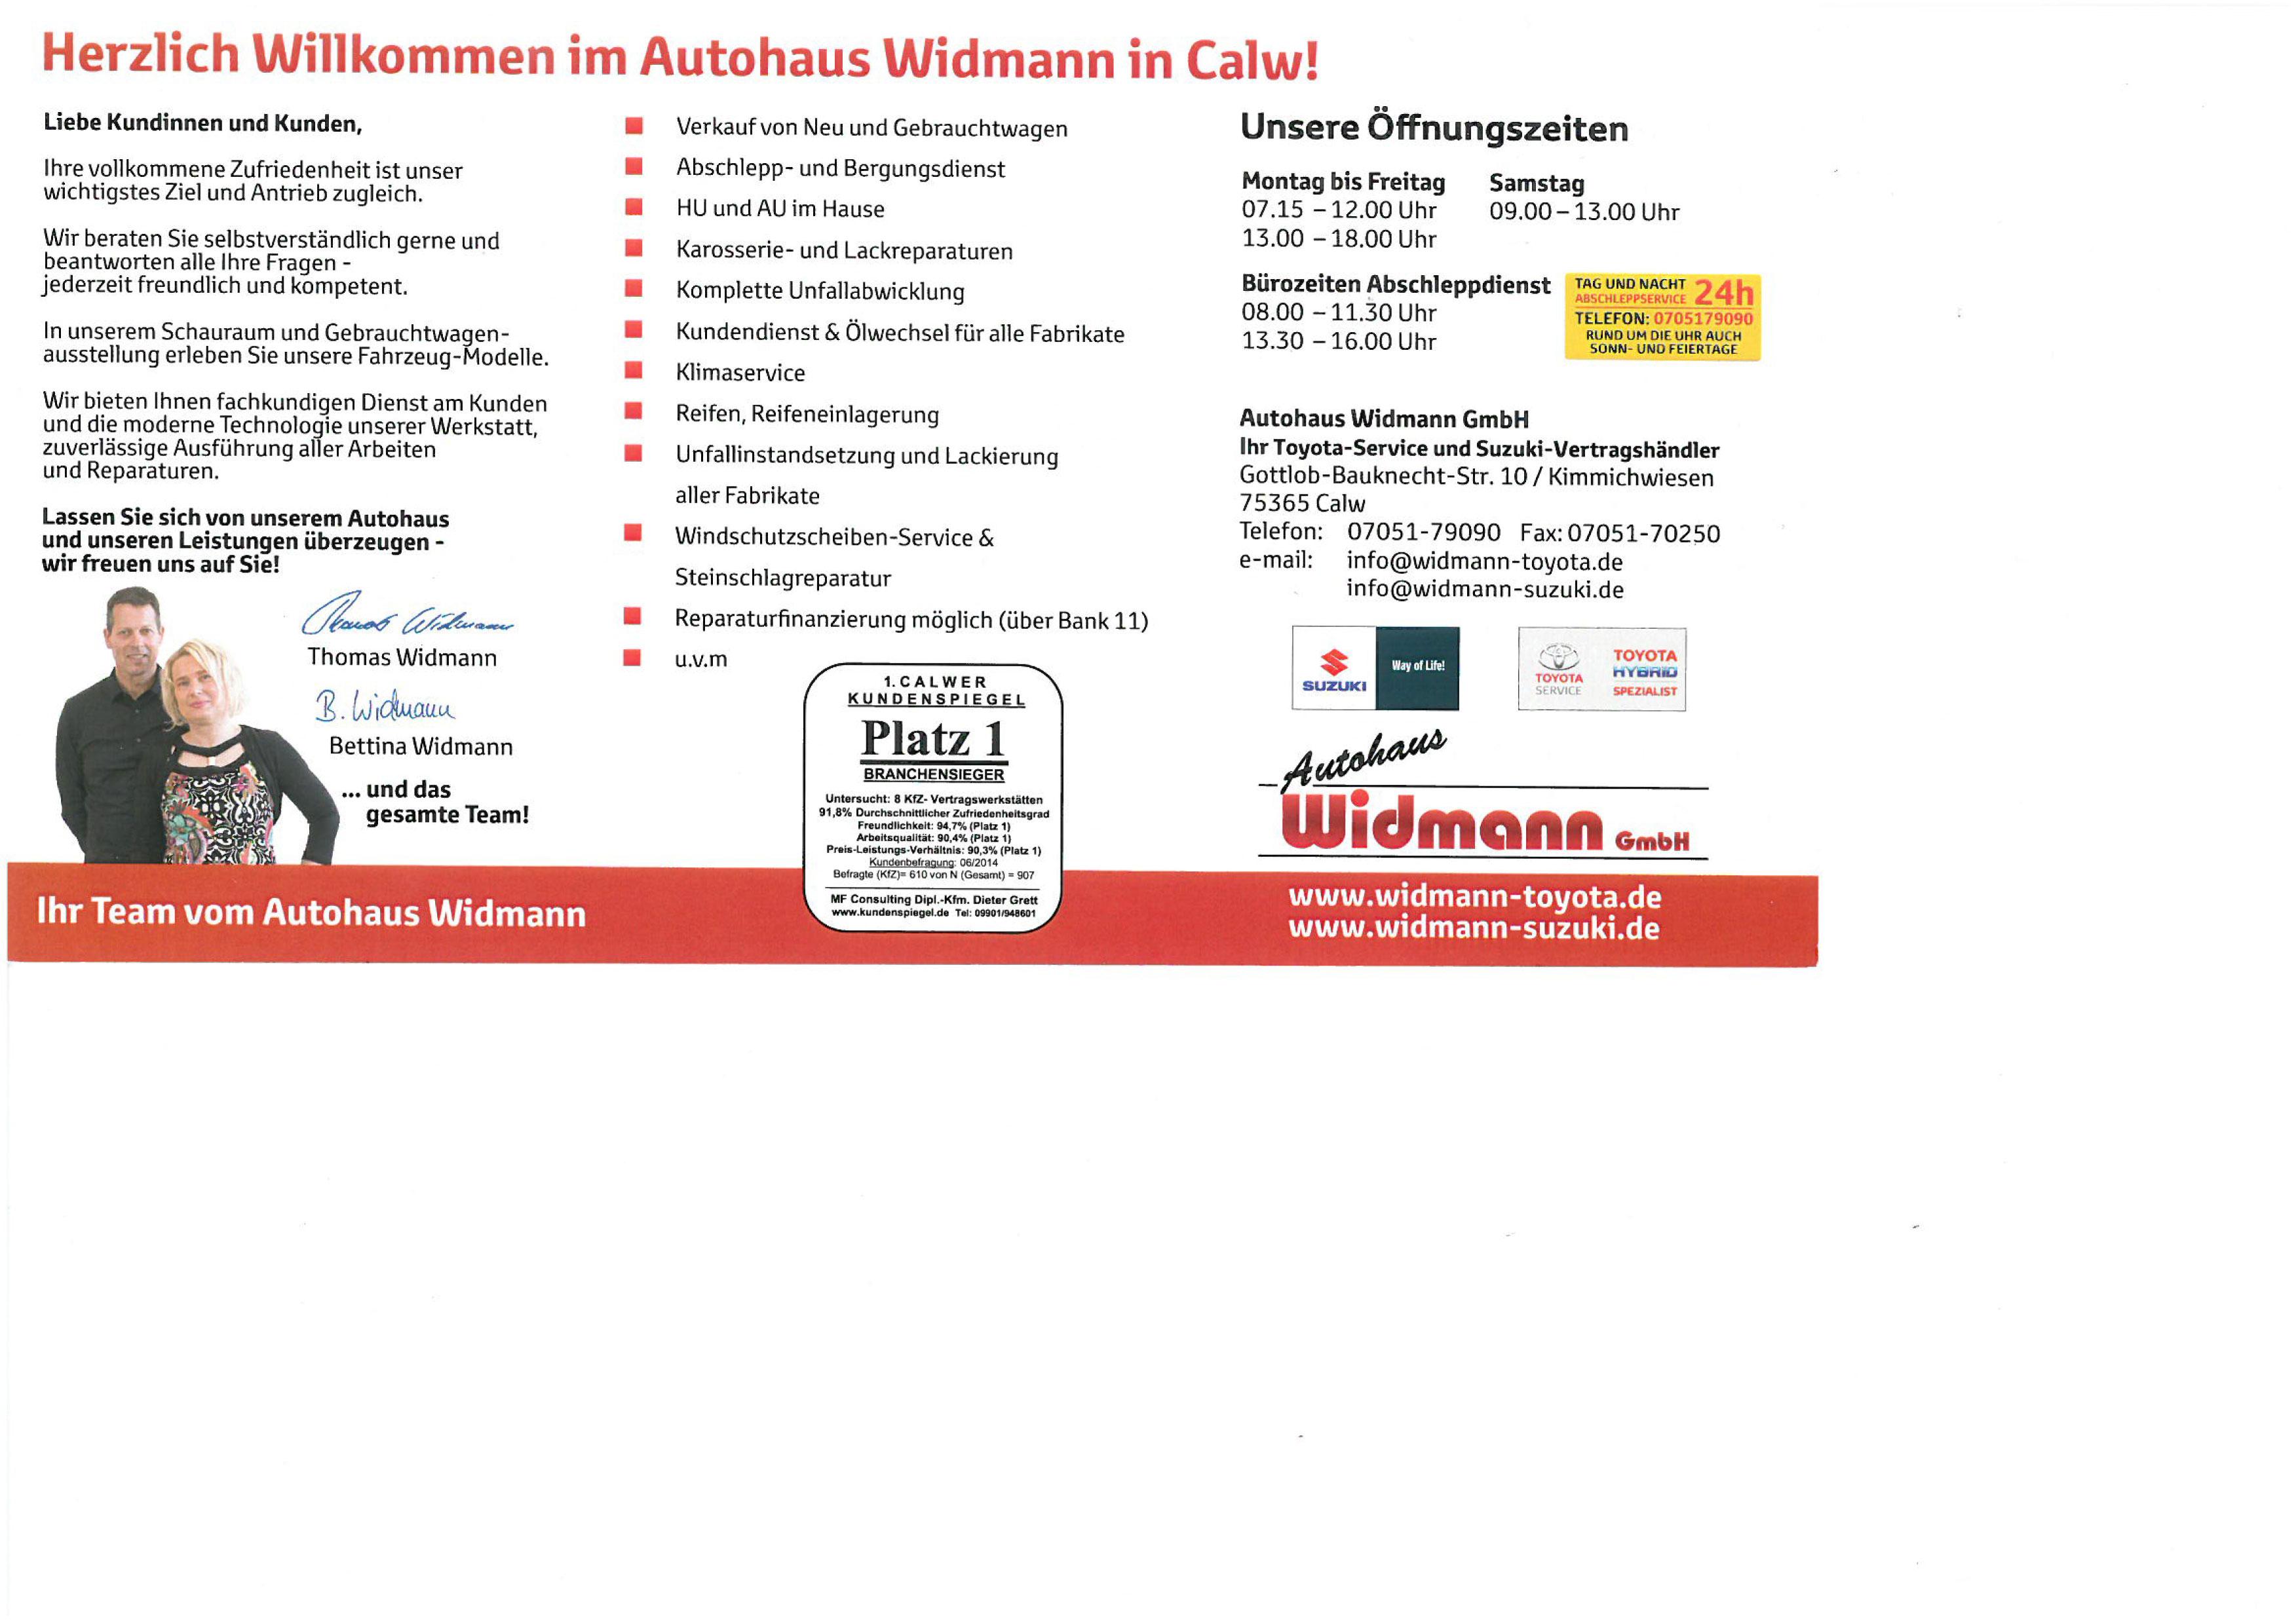 Widmann GmbH Autohaus - Toyota-Service